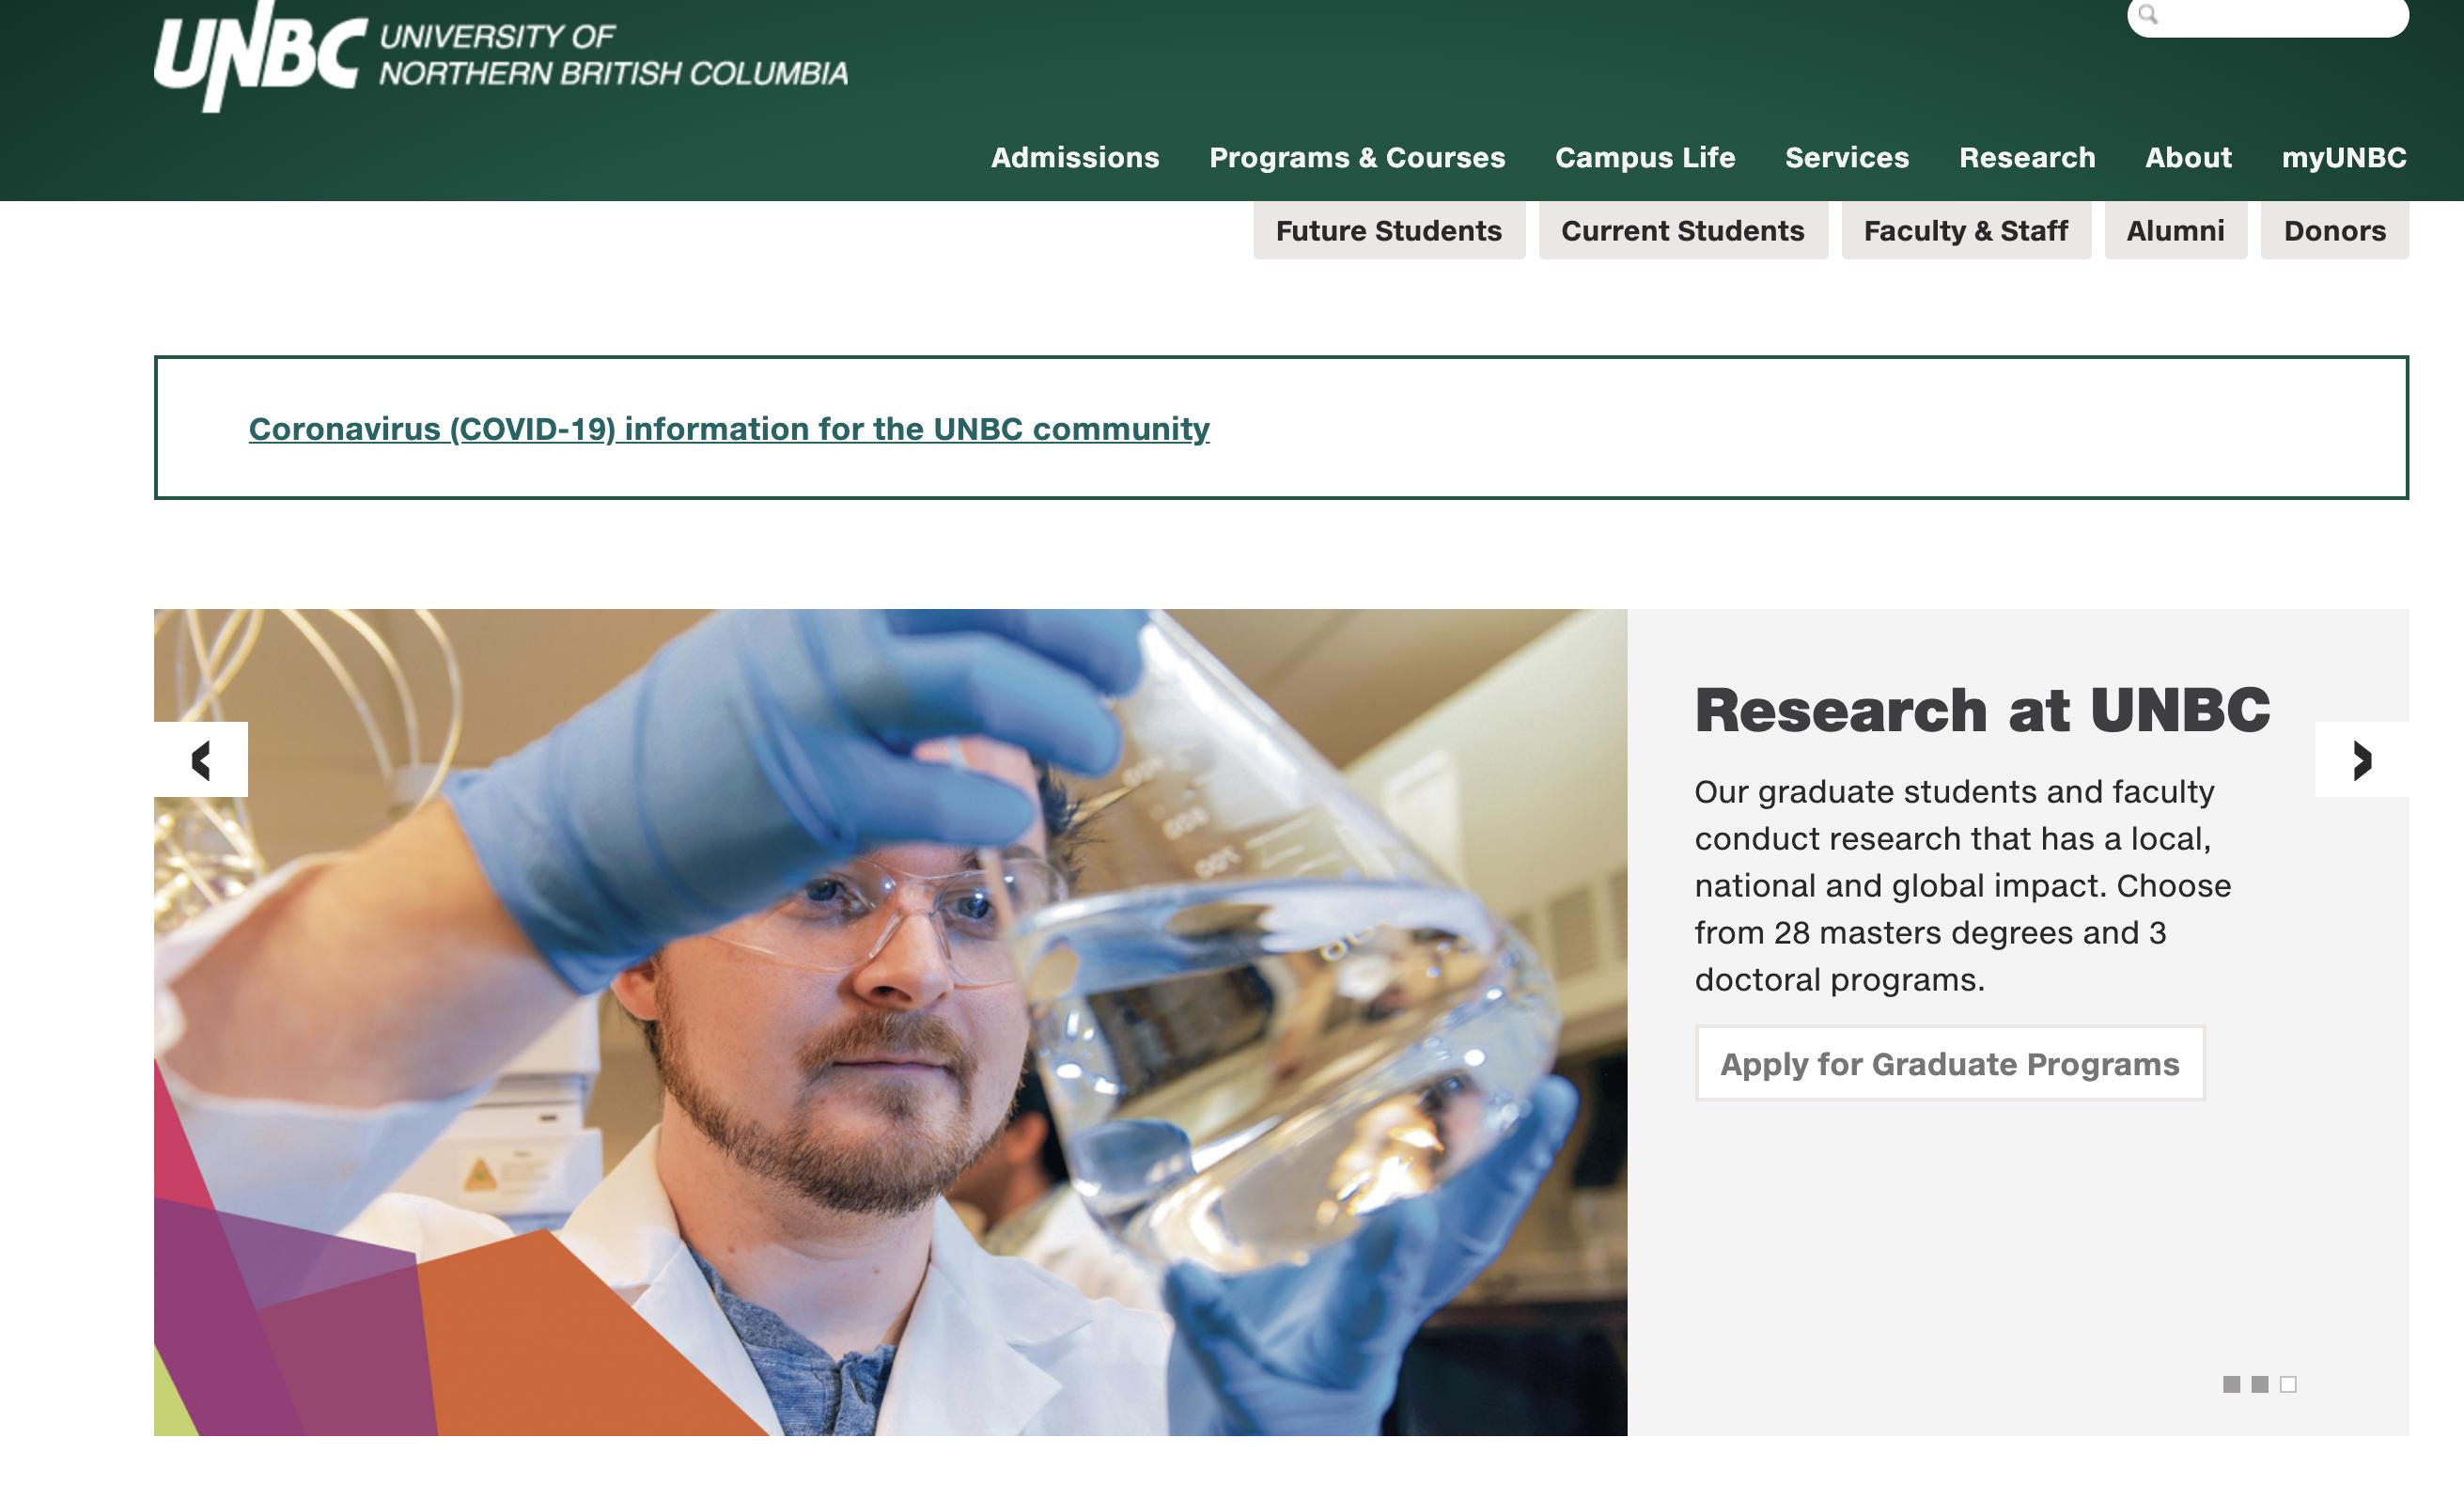 University of Northern British Columbia website header with slideshow